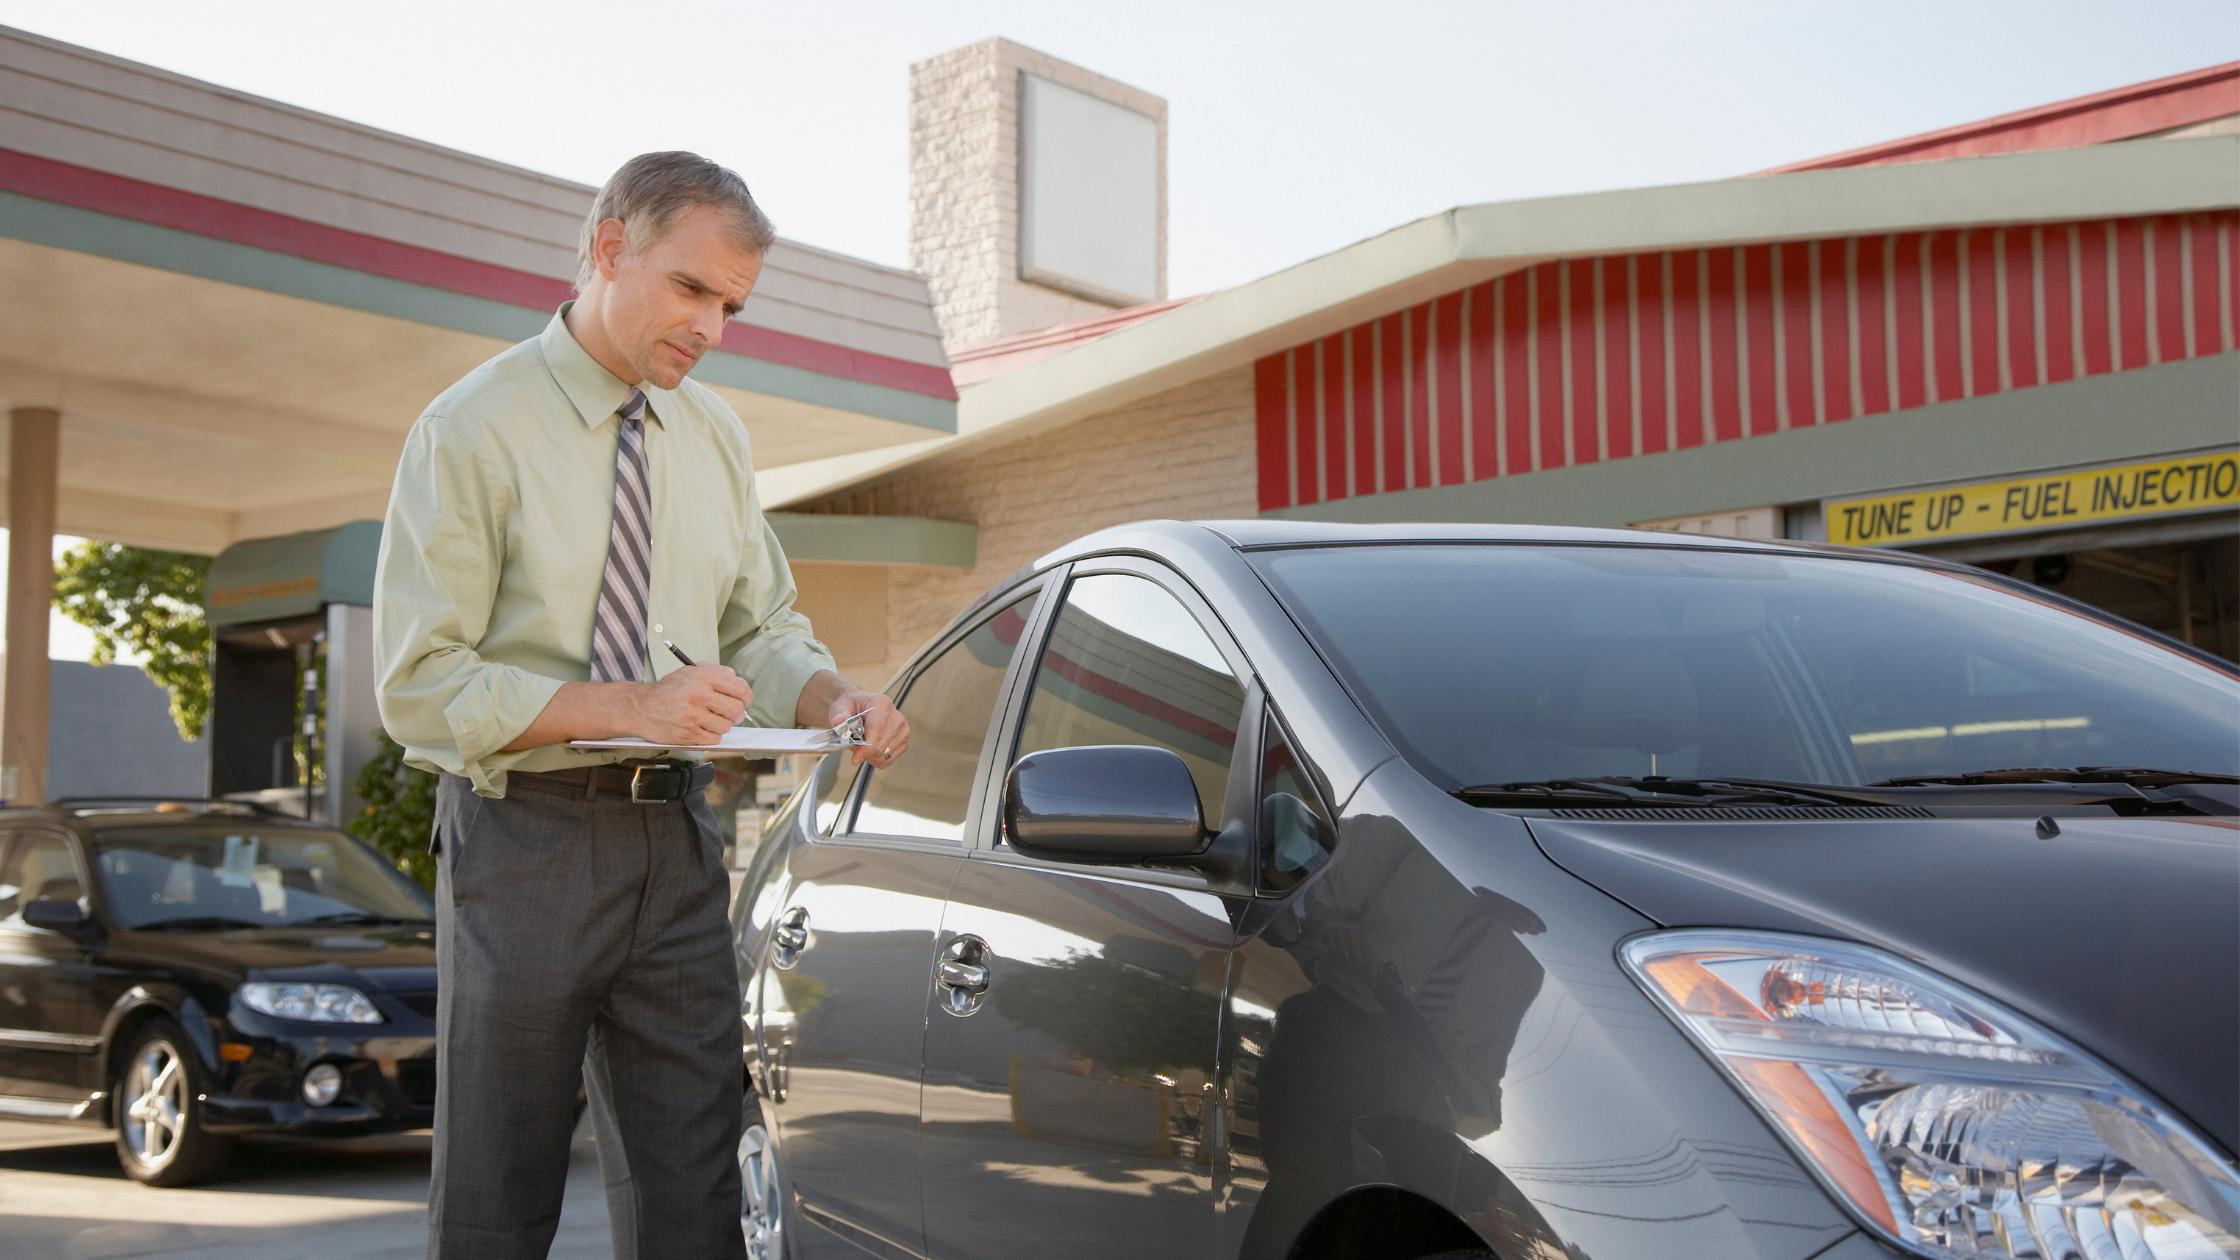 insurance adjuster observing a car